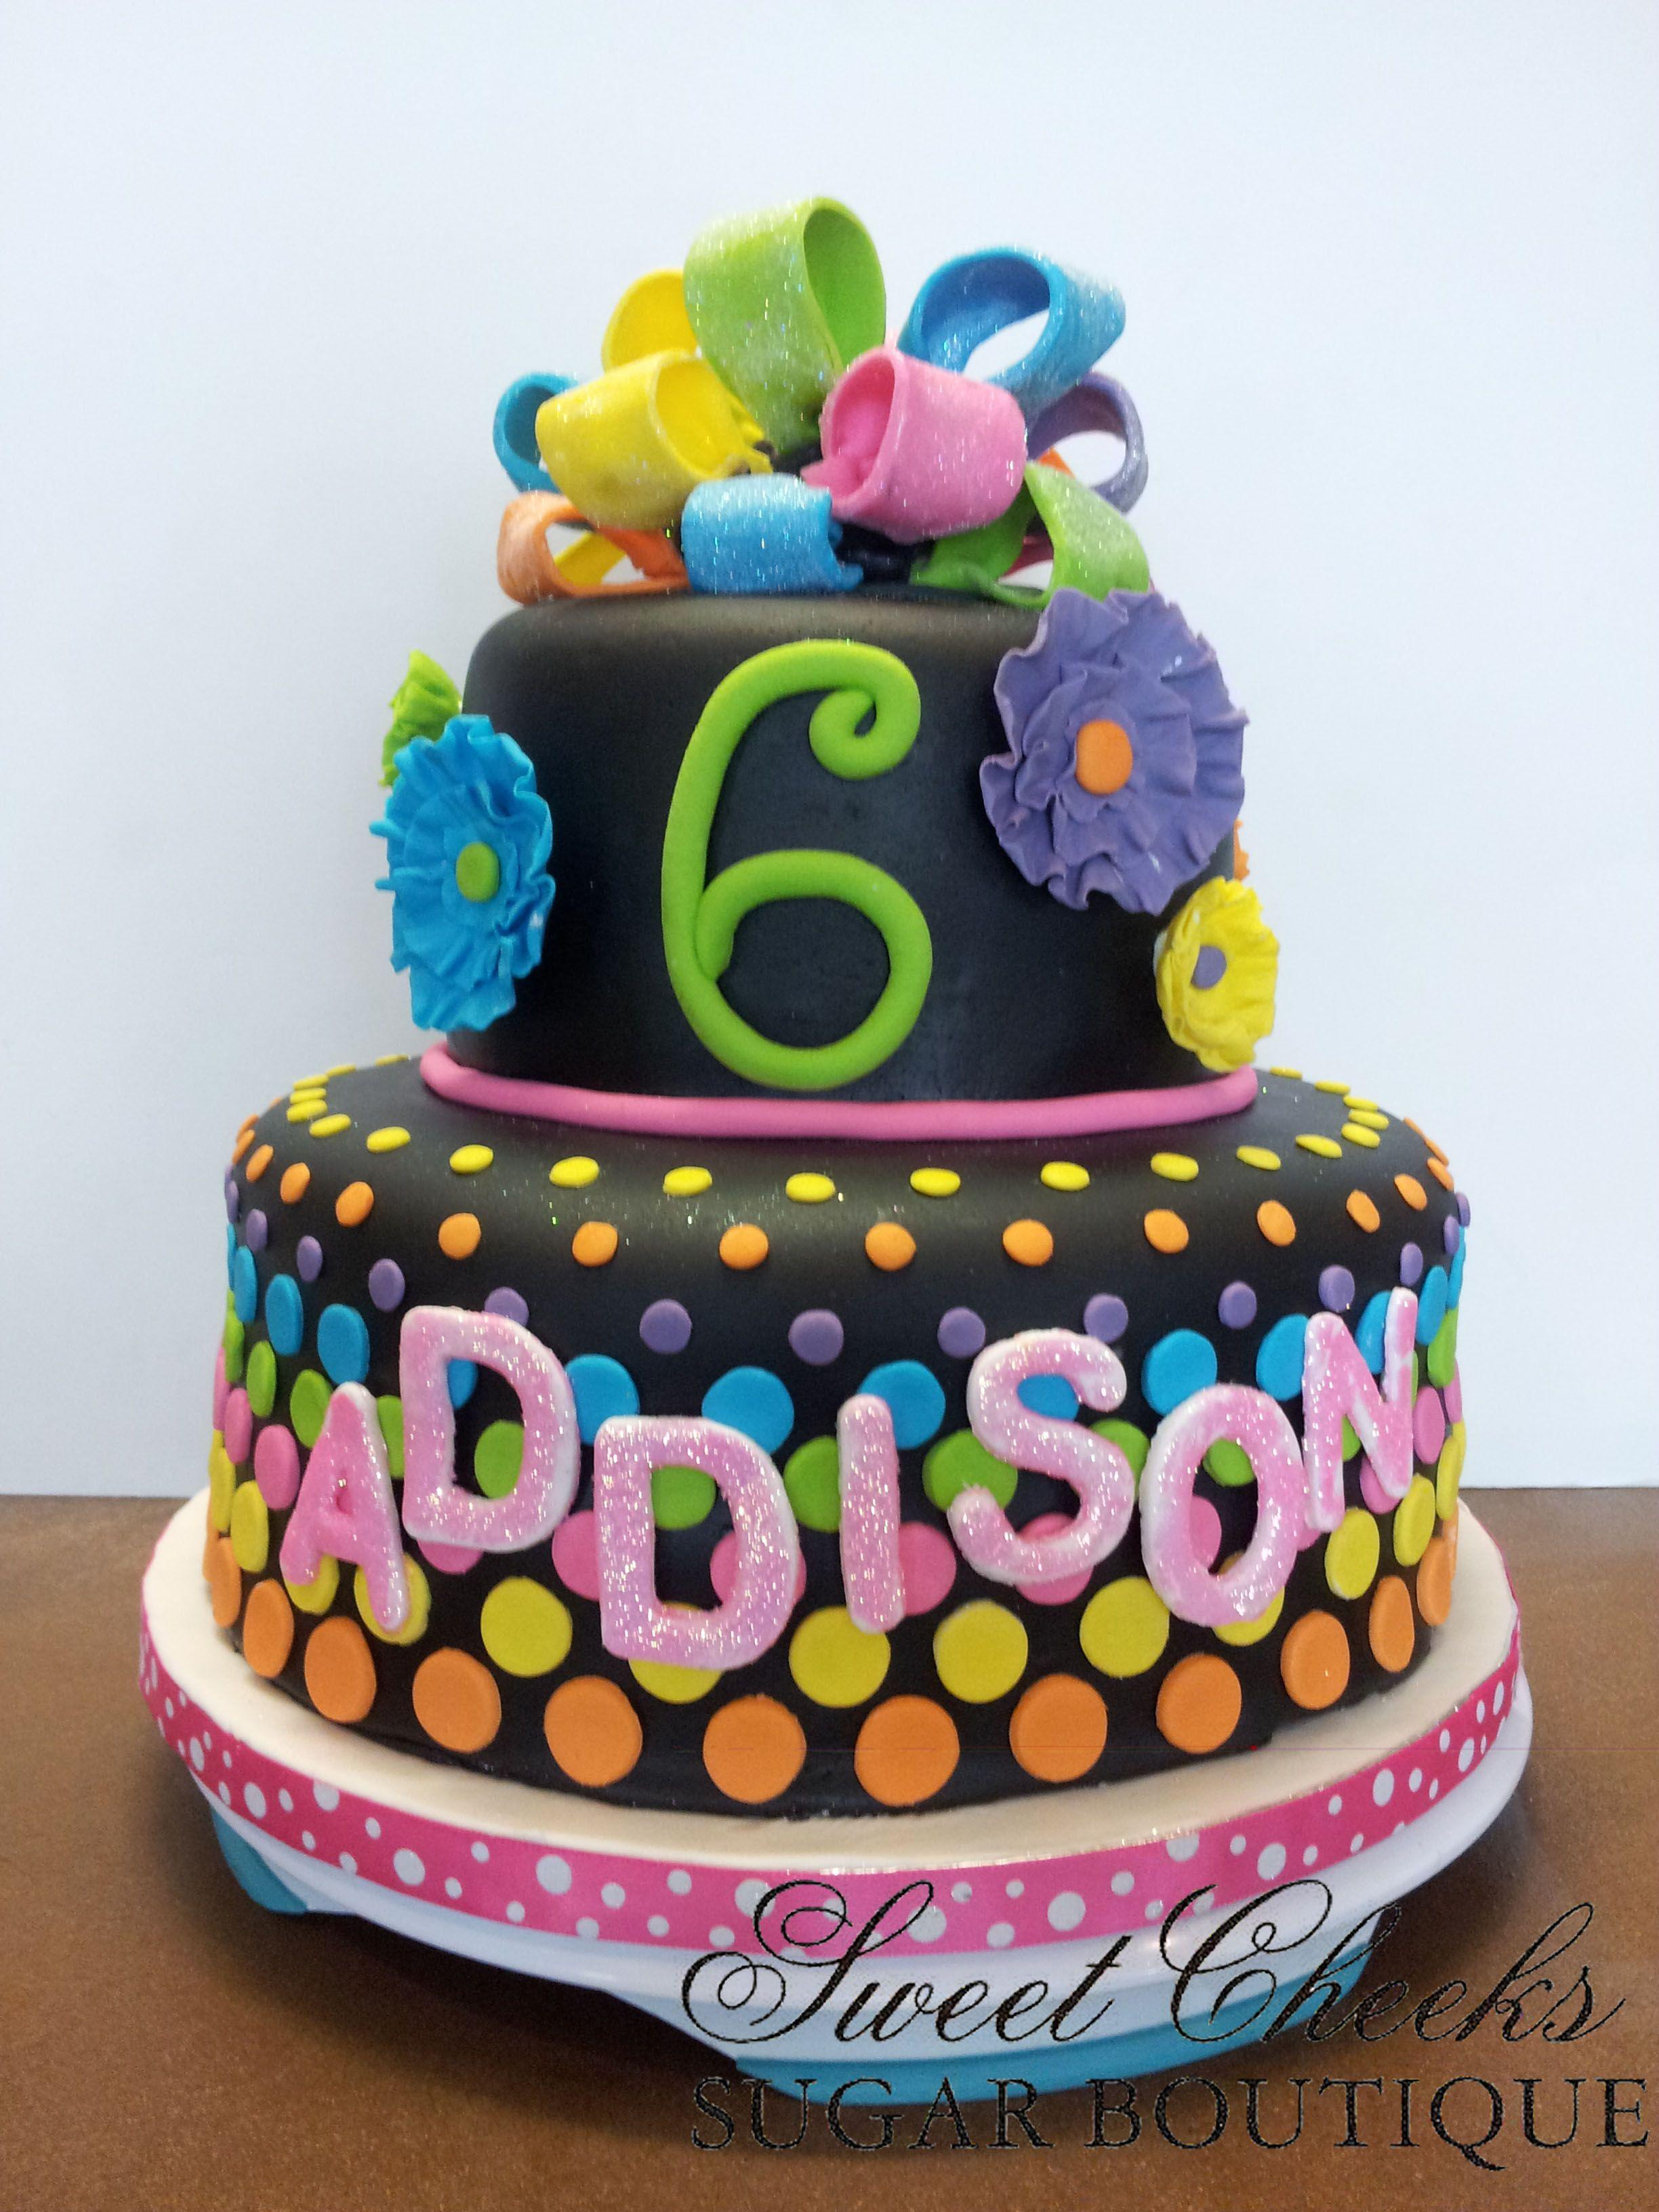 Addisons neon 6th birthday cake Happy Birthday Addison Sweet